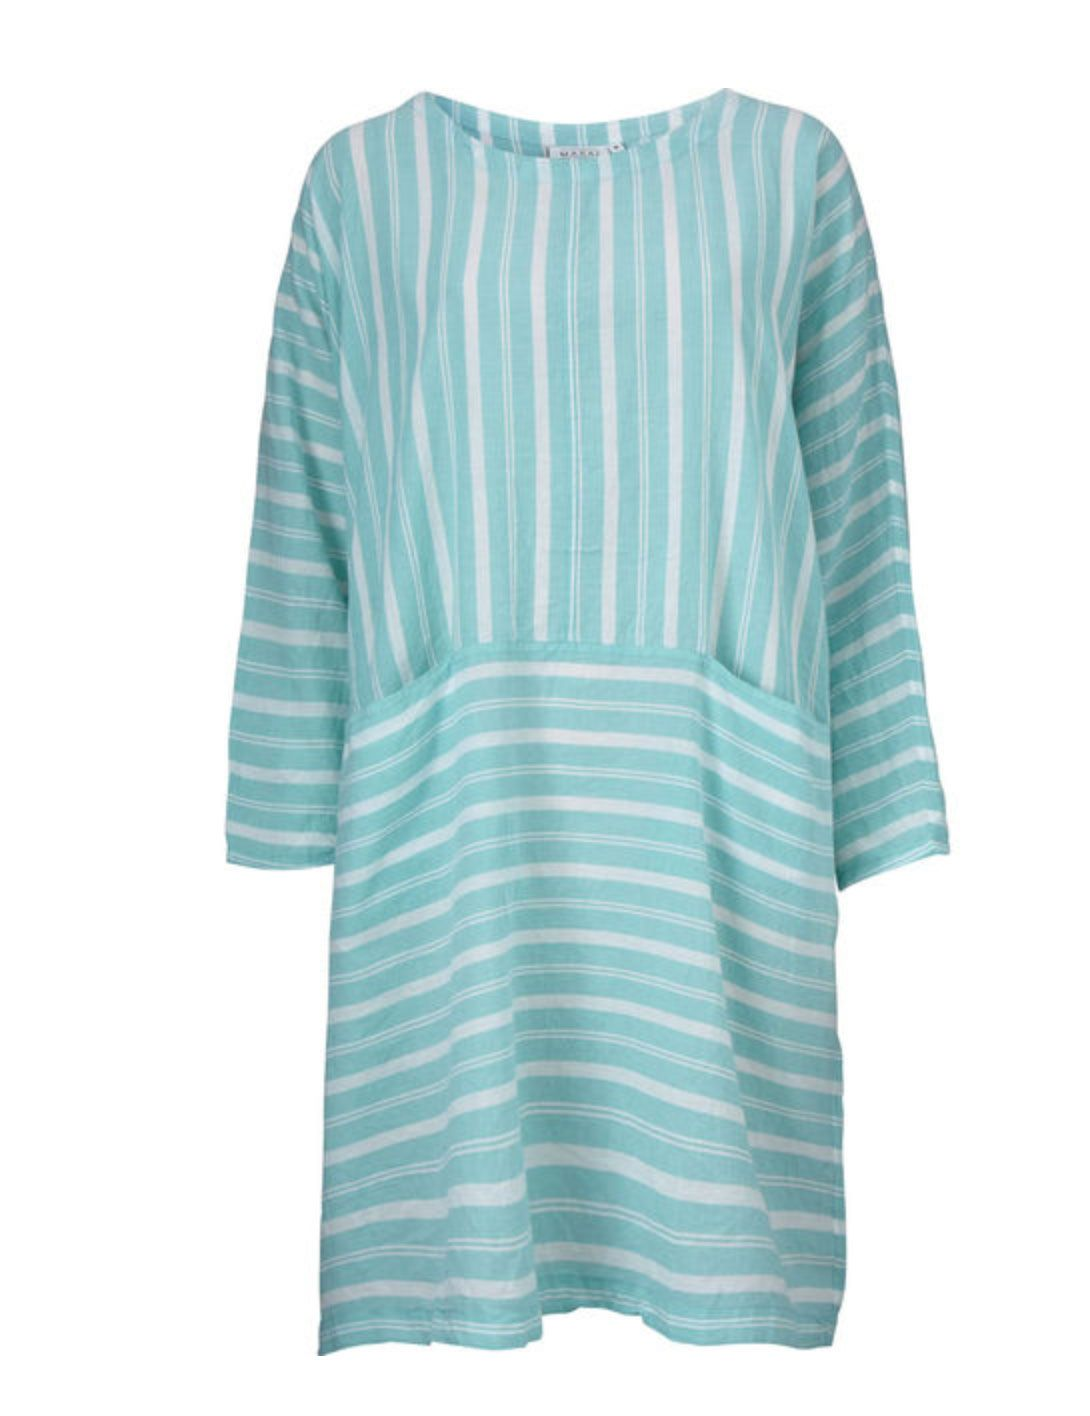 f769345da4b Masai Gylis Tunic - Aqua | Masai Clothing Company at Bijoux & Willow ...